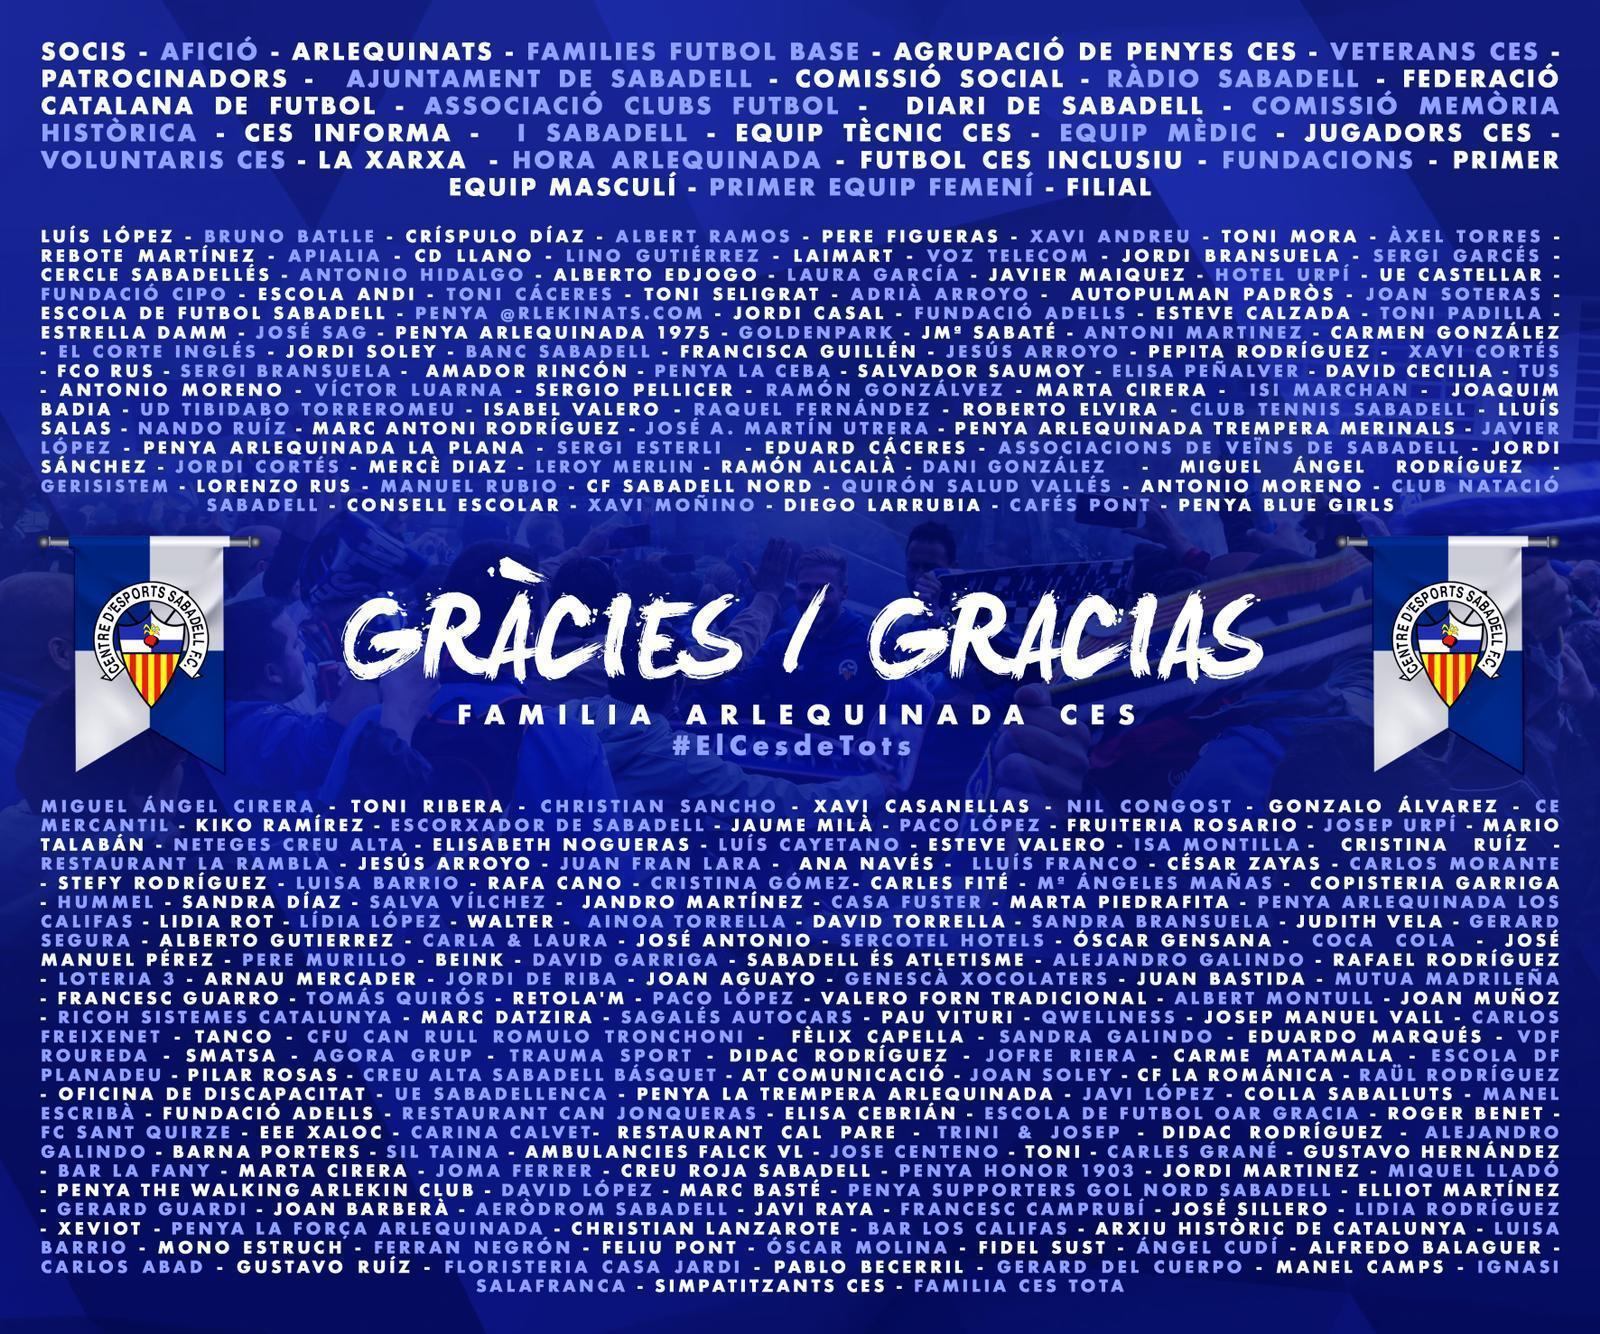 Gràcies! - CE Sabadell